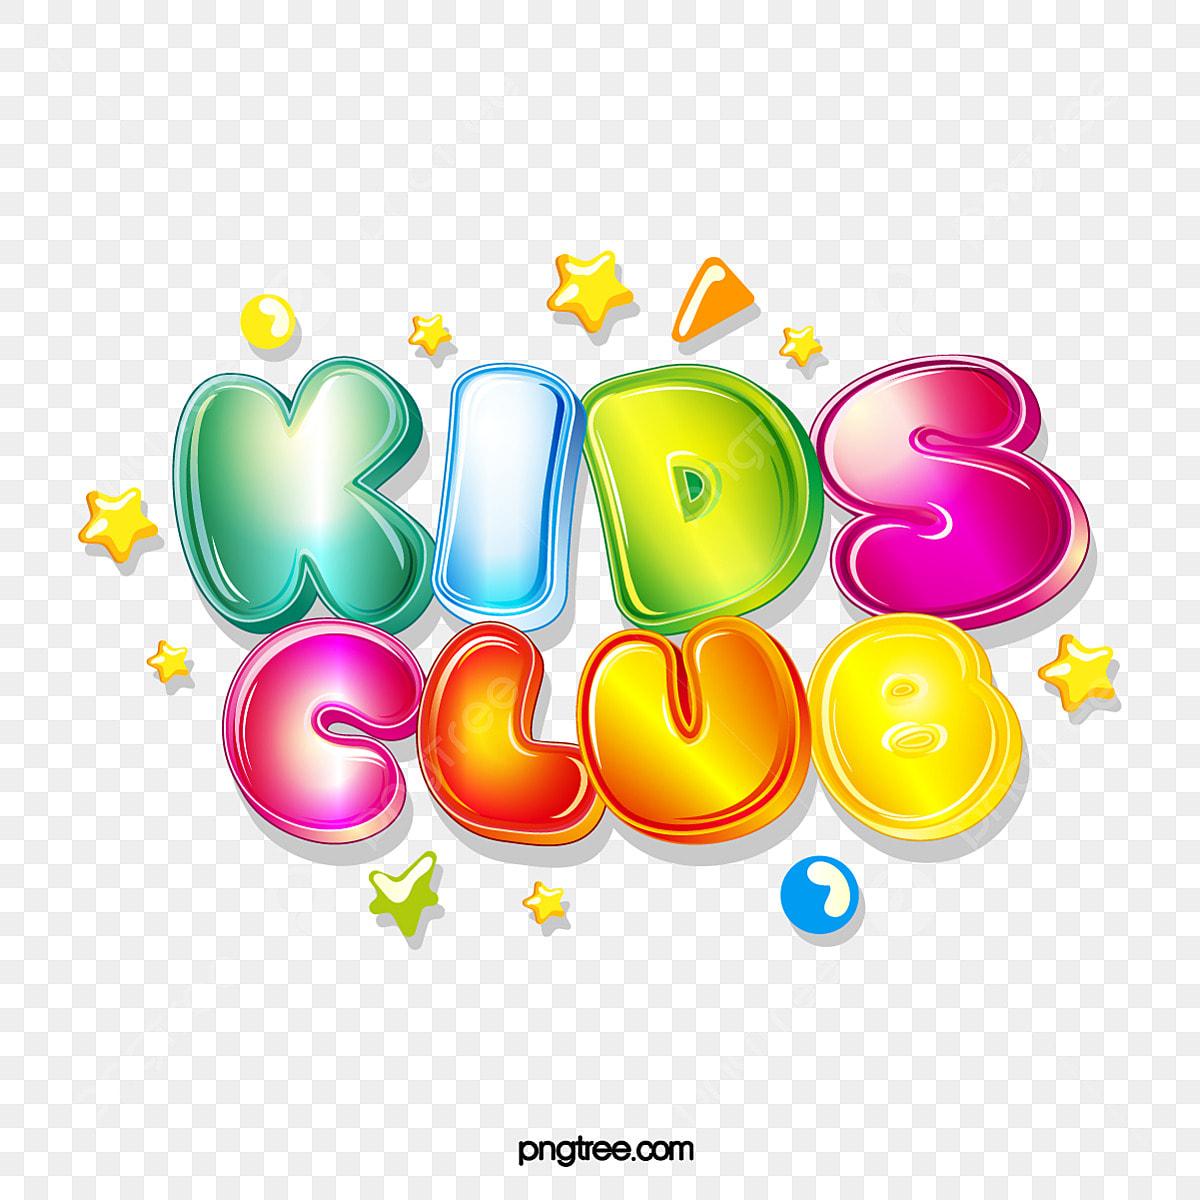 Kids Club Cute Bubble Jelly Stereo Gradient Word Art Children S